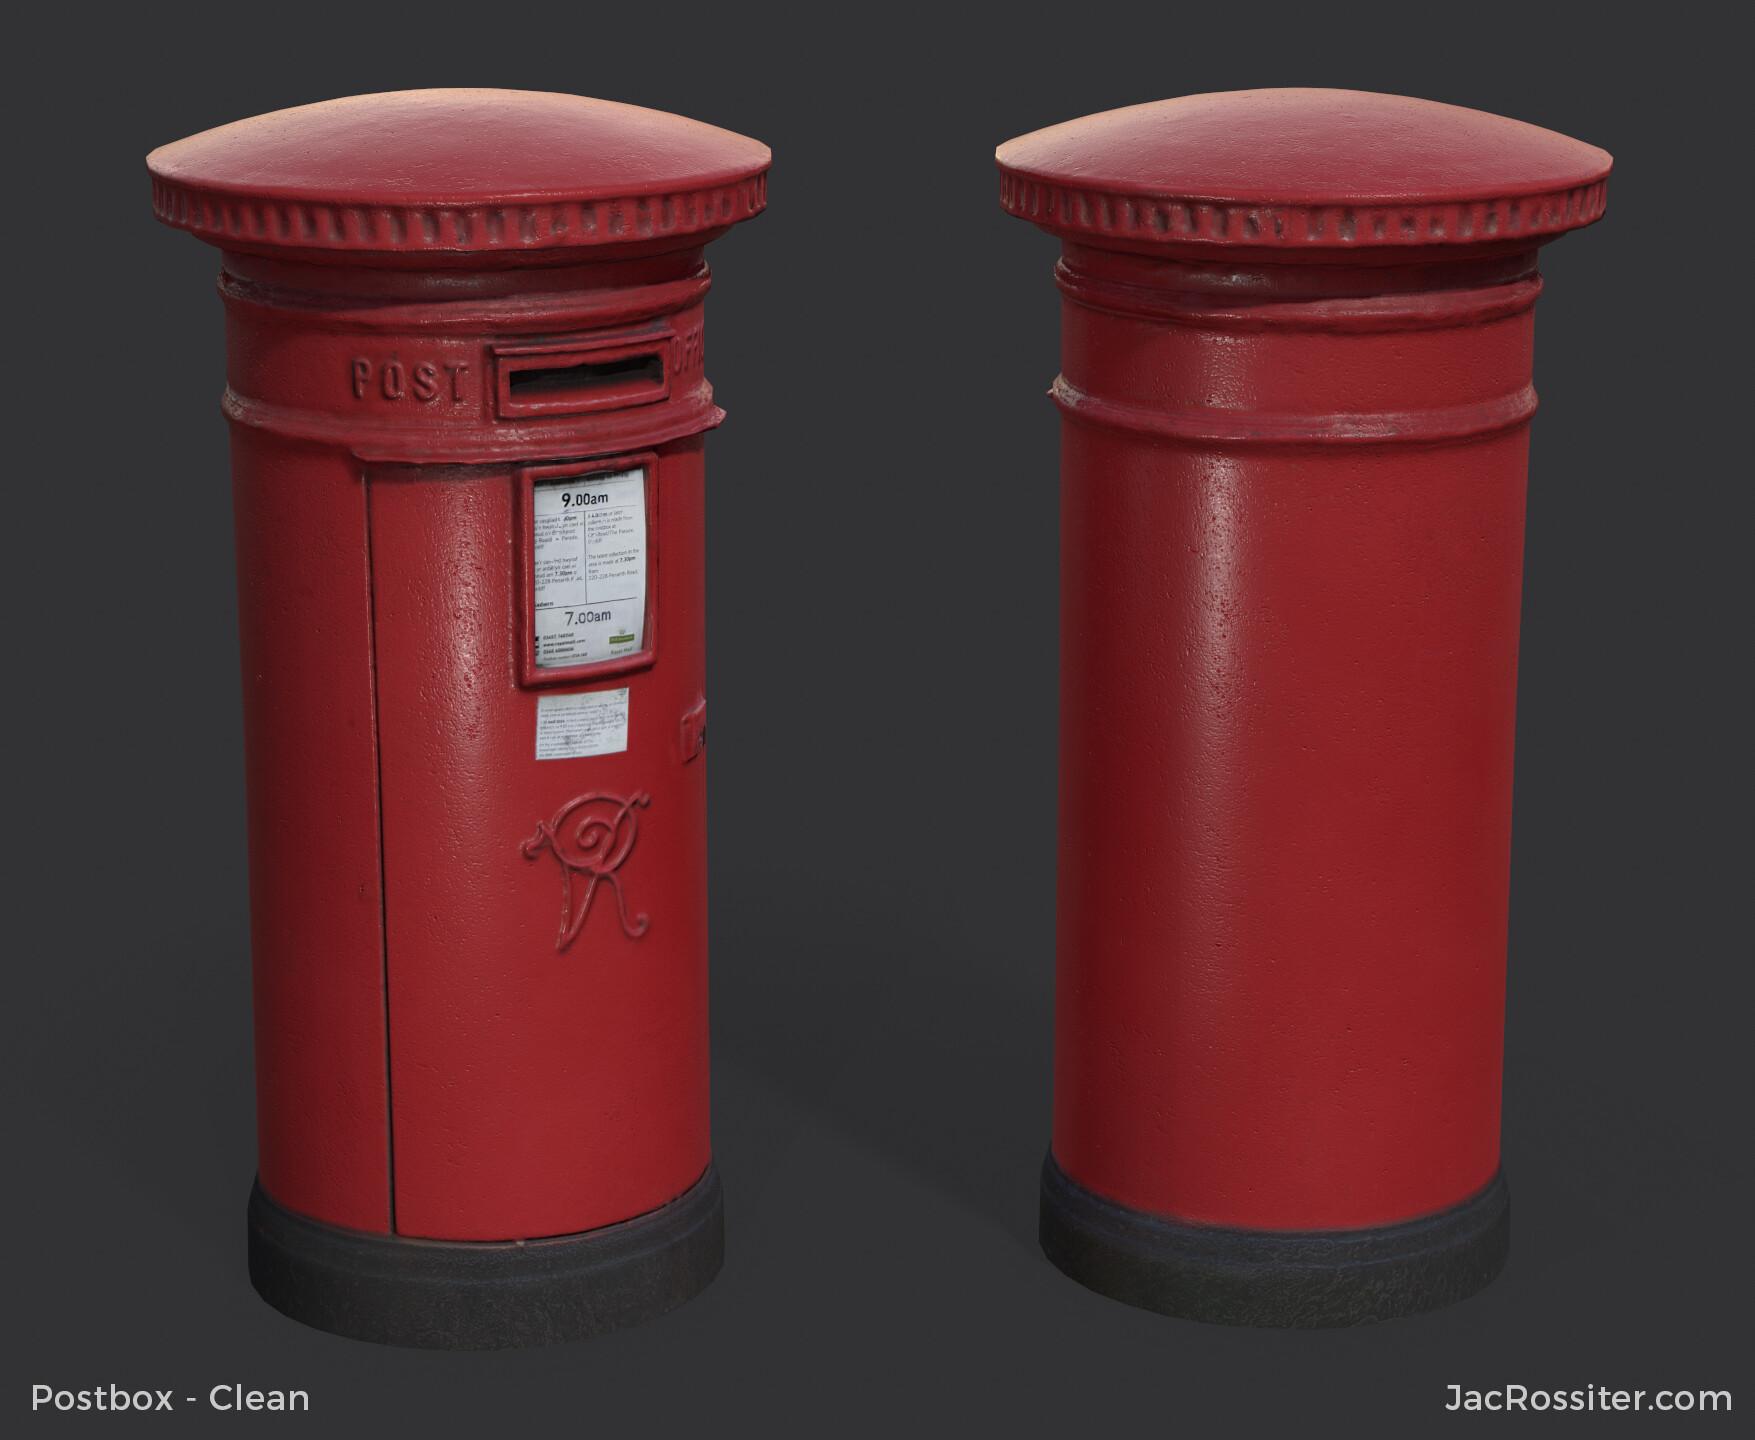 Jac rossiter postbox render b